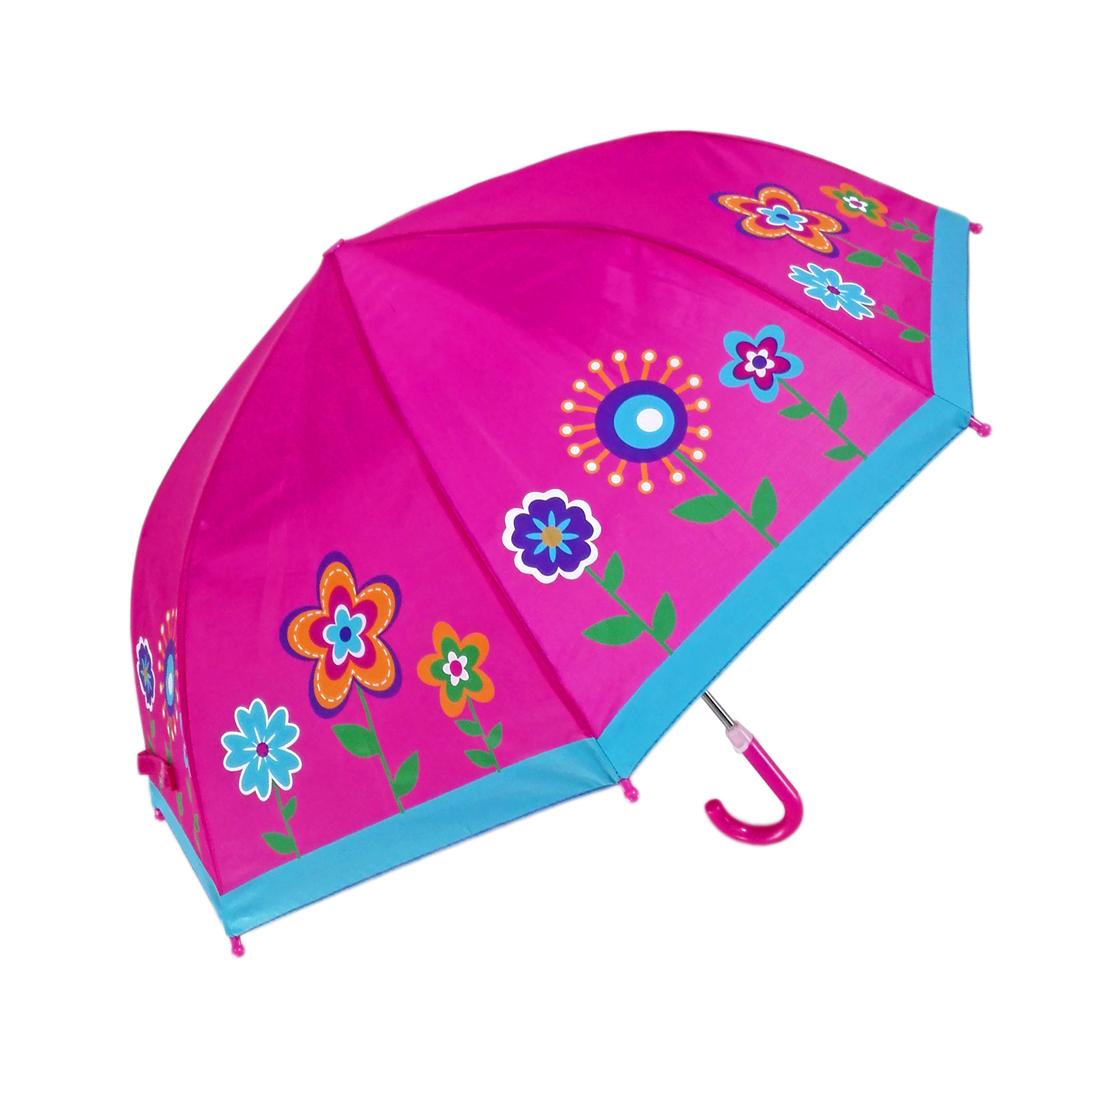 Зонты Mary Poppins Зонт детский Mary Poppins « Цветы» 41 см ang 207 магнит верности и дружбы